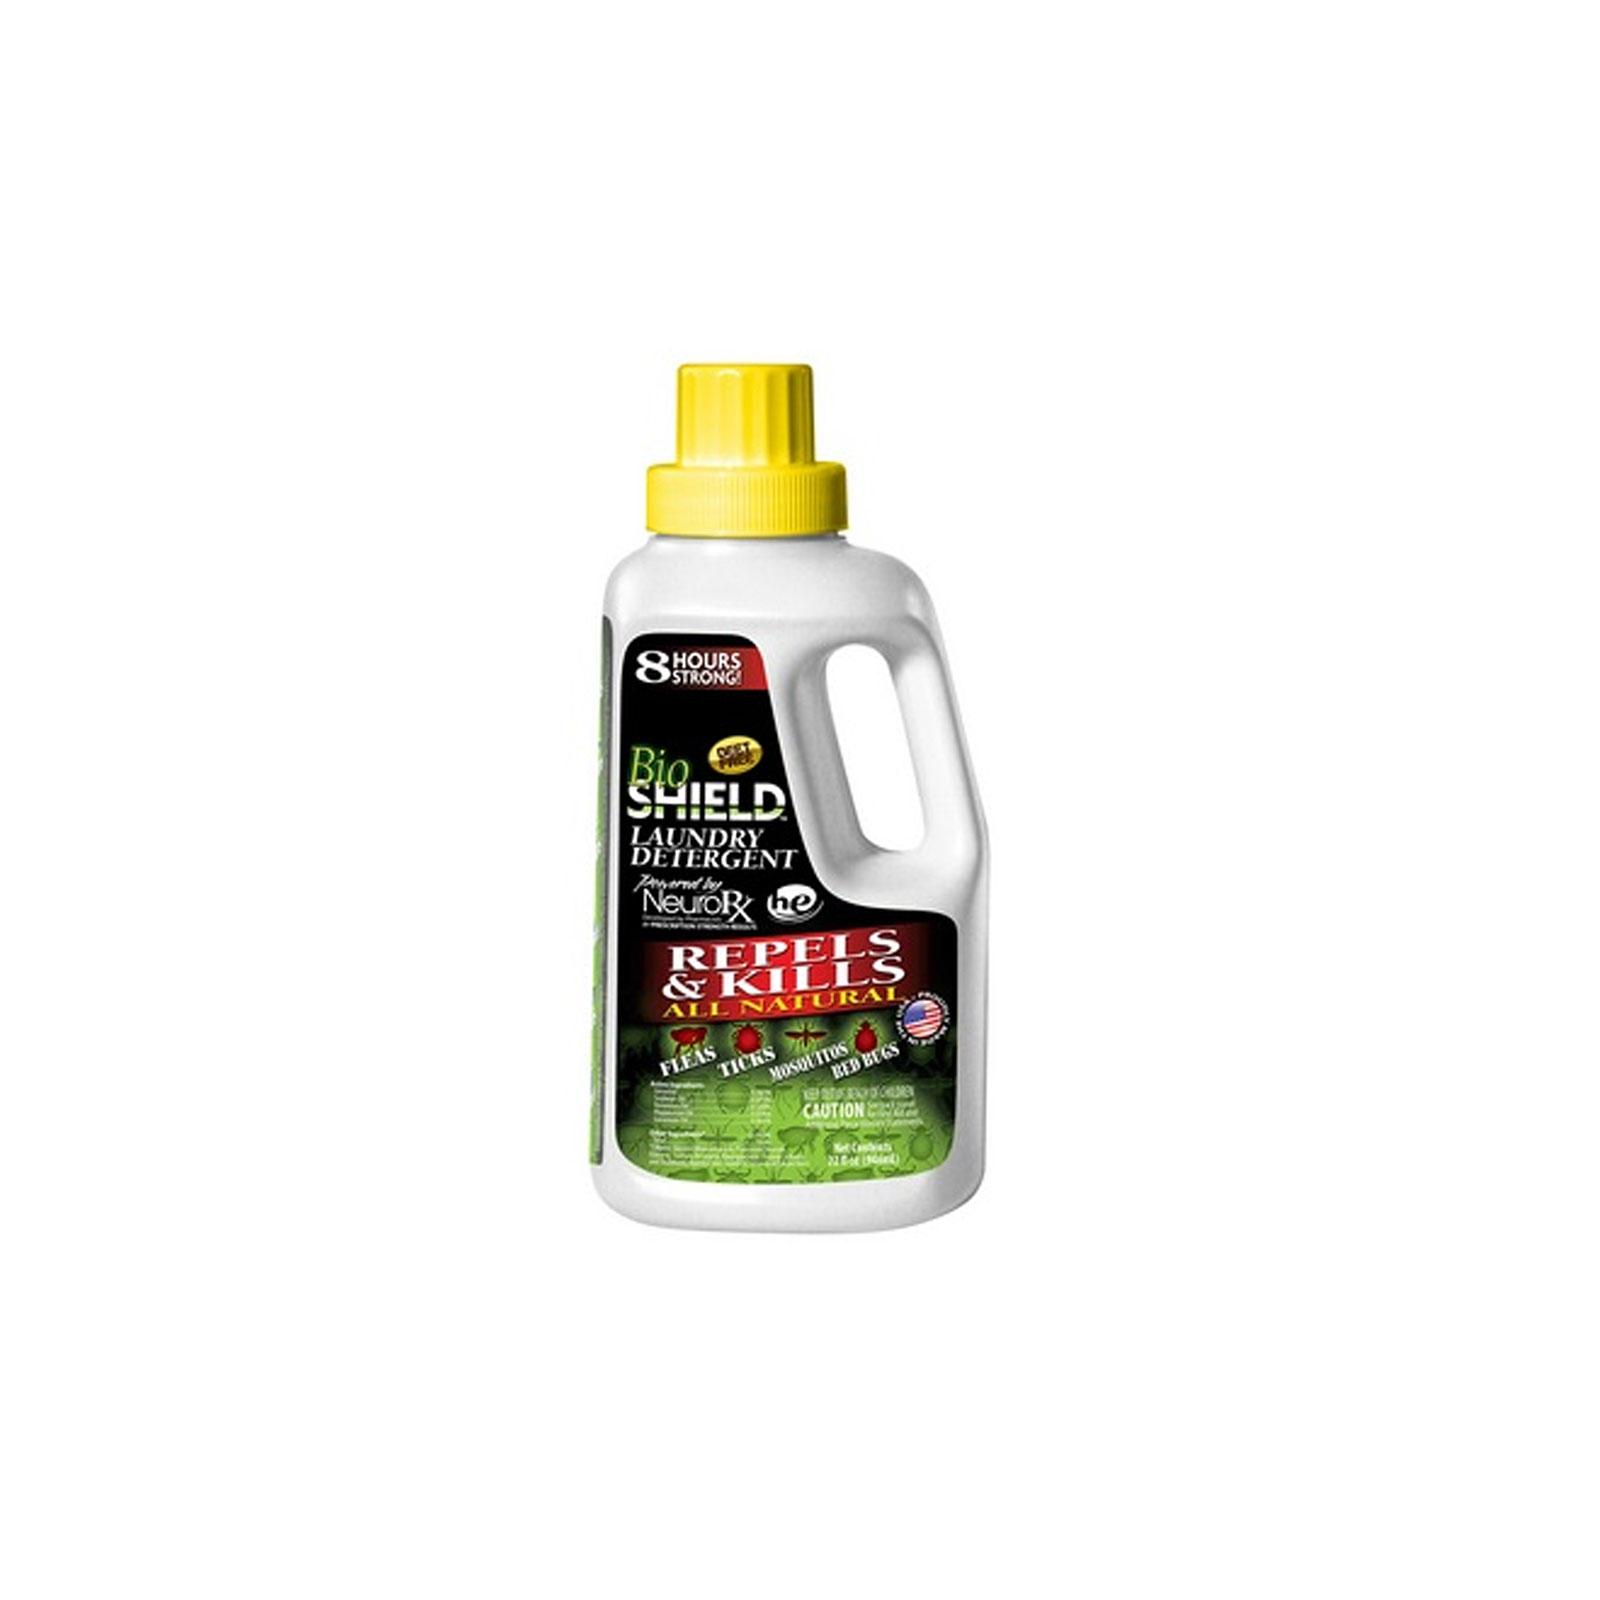 Bio Shield Bs1003 High Efficiency Laundry Detergent 32 Fl